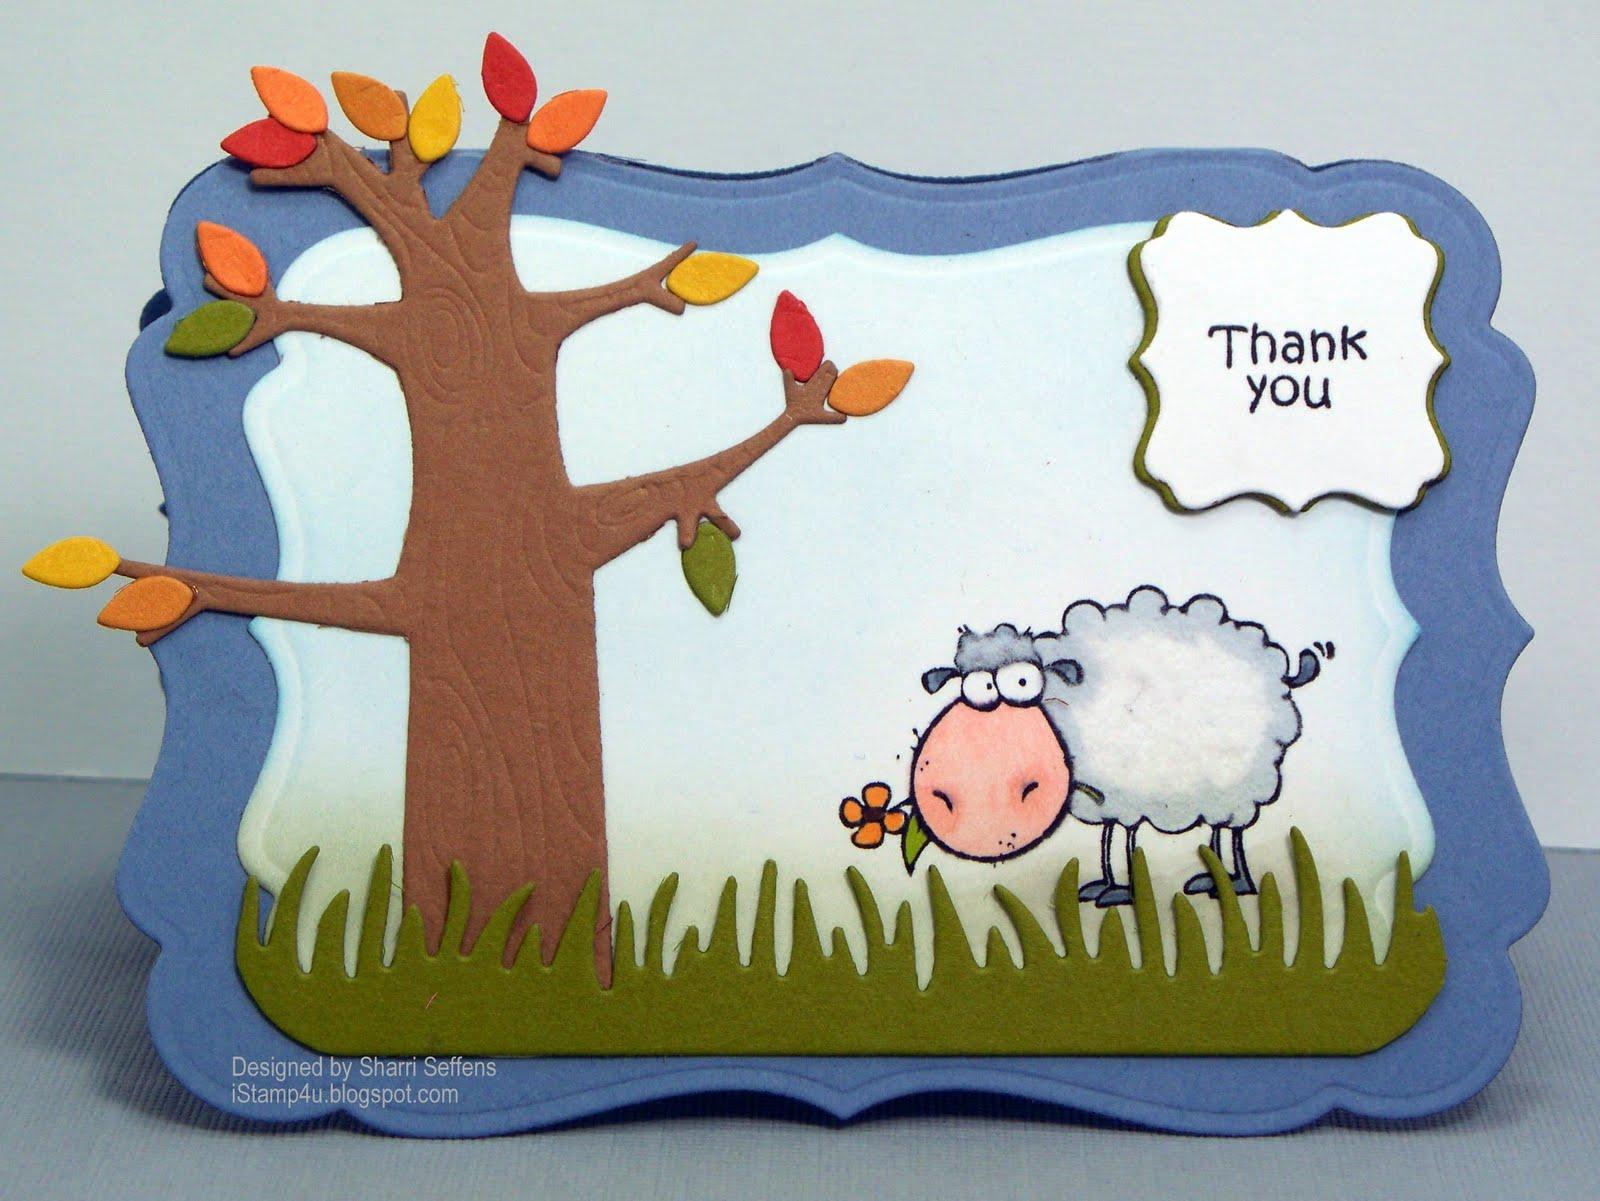 http://3.bp.blogspot.com/_OQ6nNaOqD40/TLIBmM9mzpI/AAAAAAAACCM/2Jd256DfF_Y/s1600/funny+farm+hop+-+thank+you.jpg